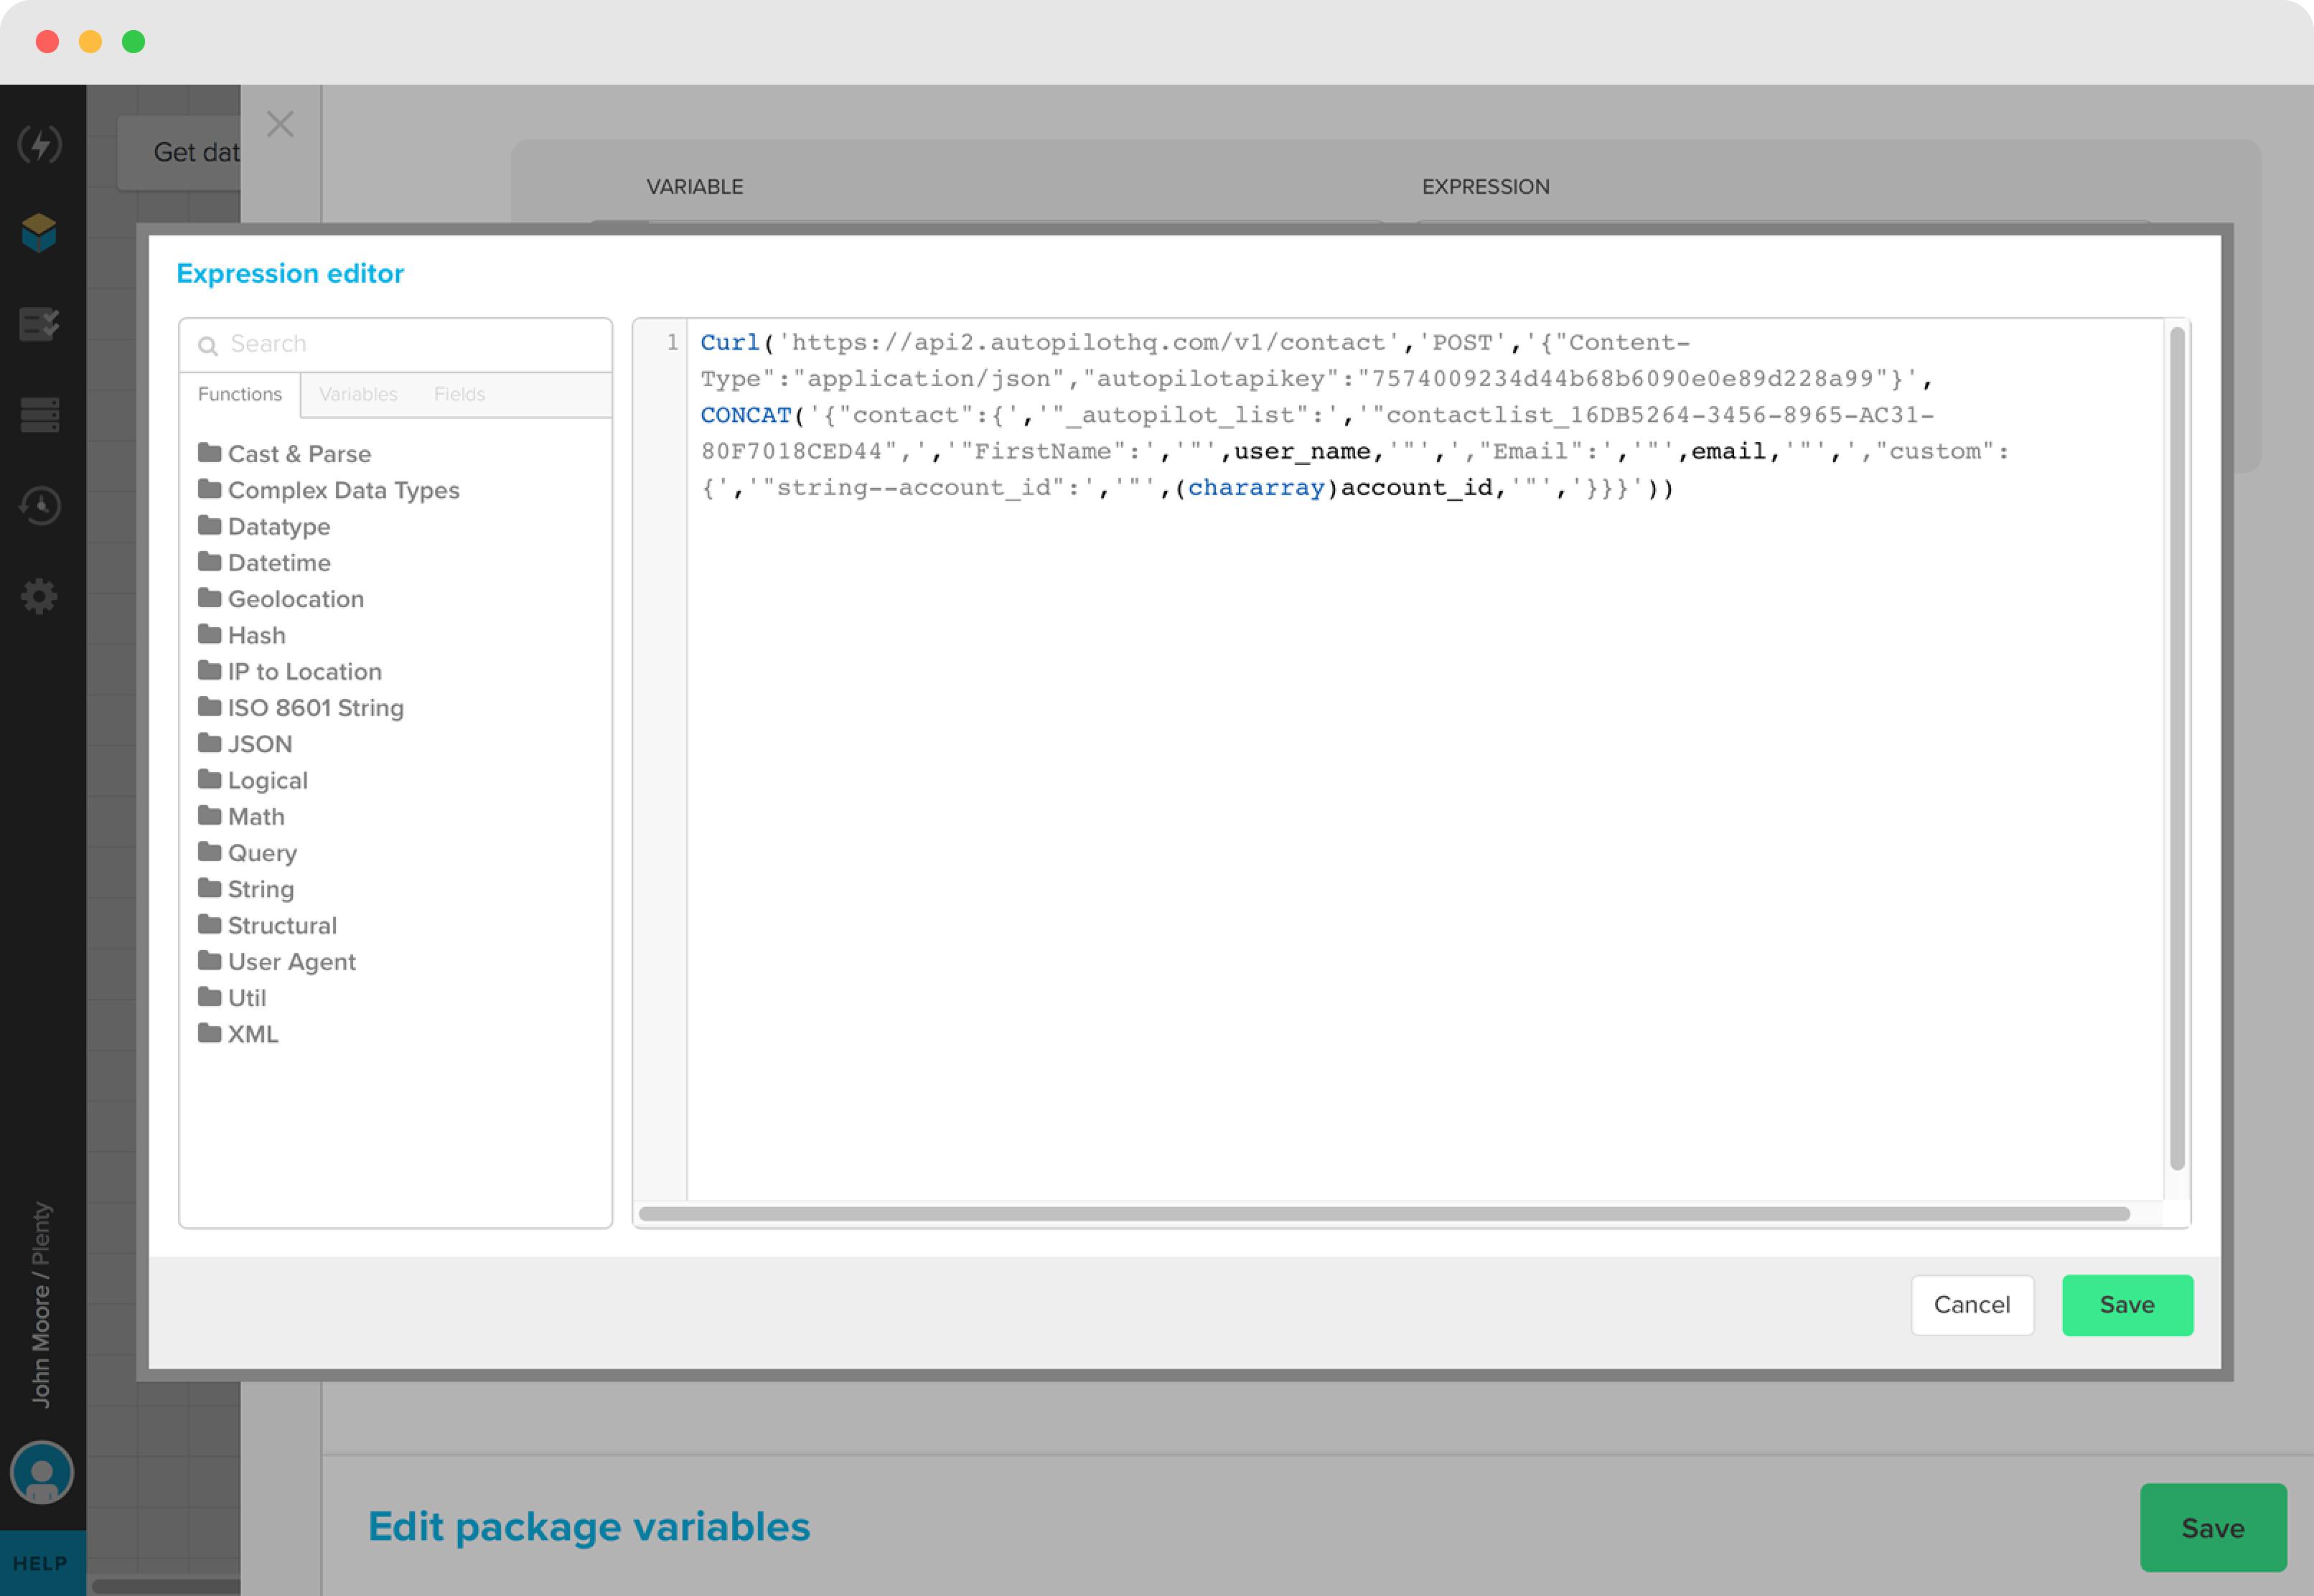 Xplenty Demo - screenshot-2